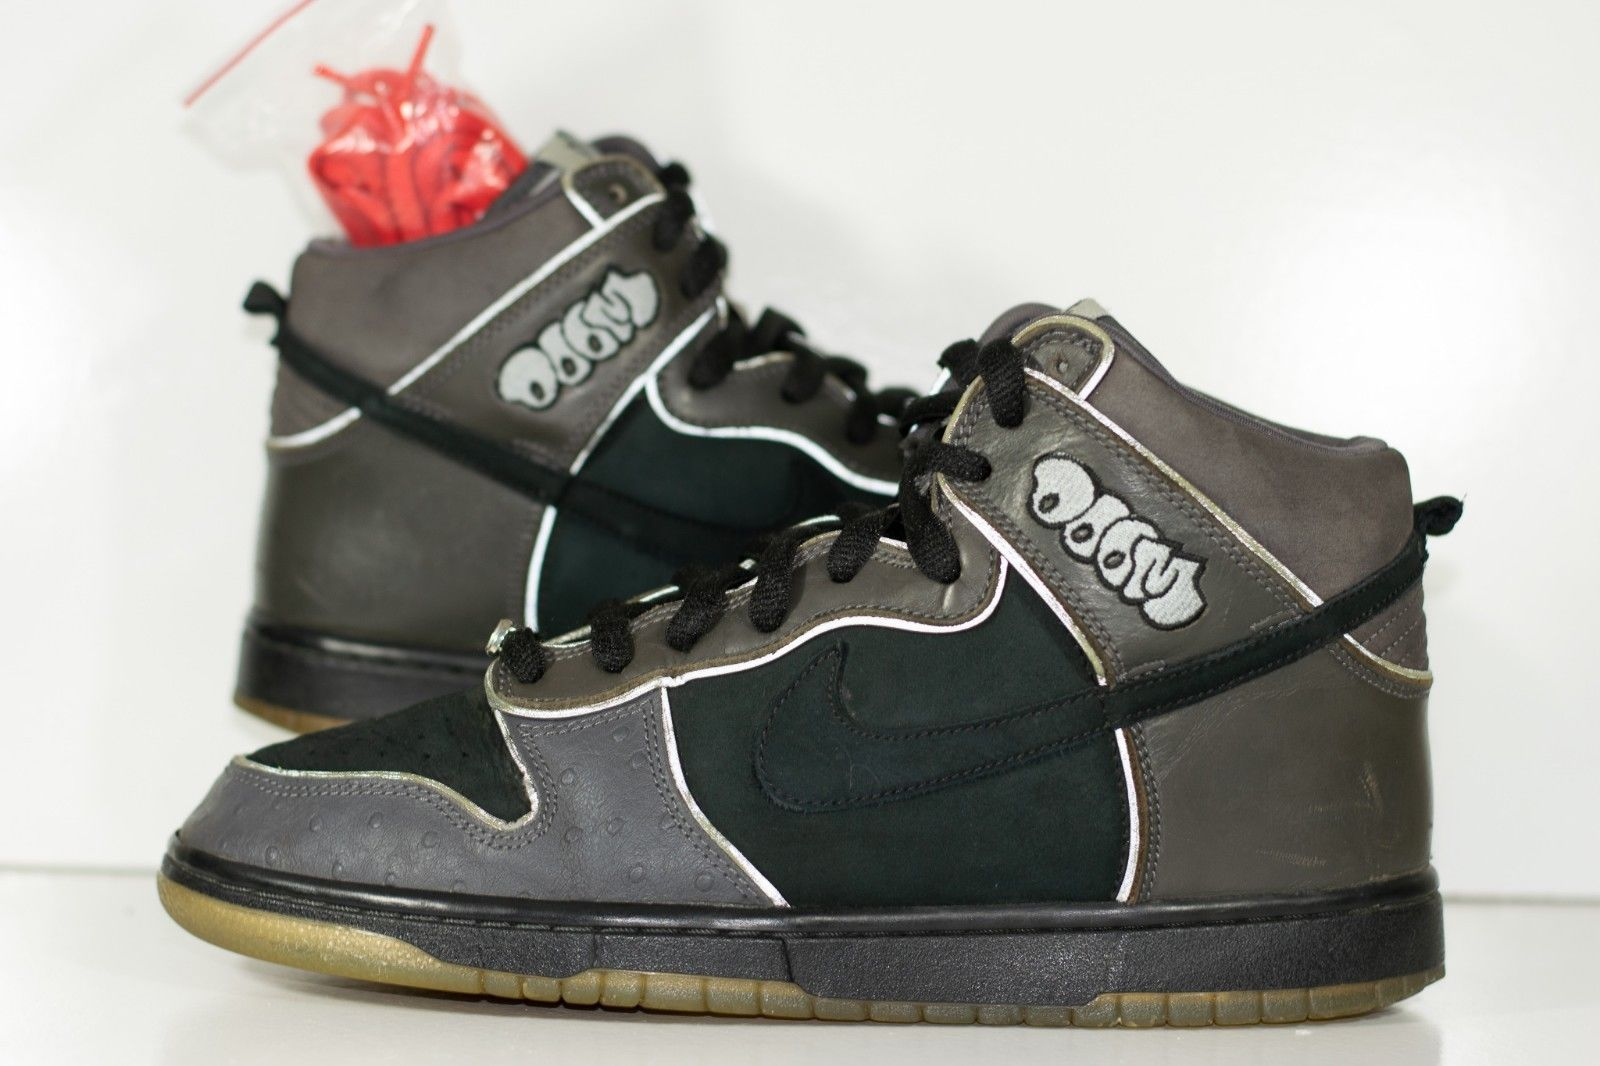 online store b68d7 d3d99 Size 10 | 2007 Nike Dunk High Pro SB MF Doom #313171-004  Black/Black/Midnight Fog from BucksVintage